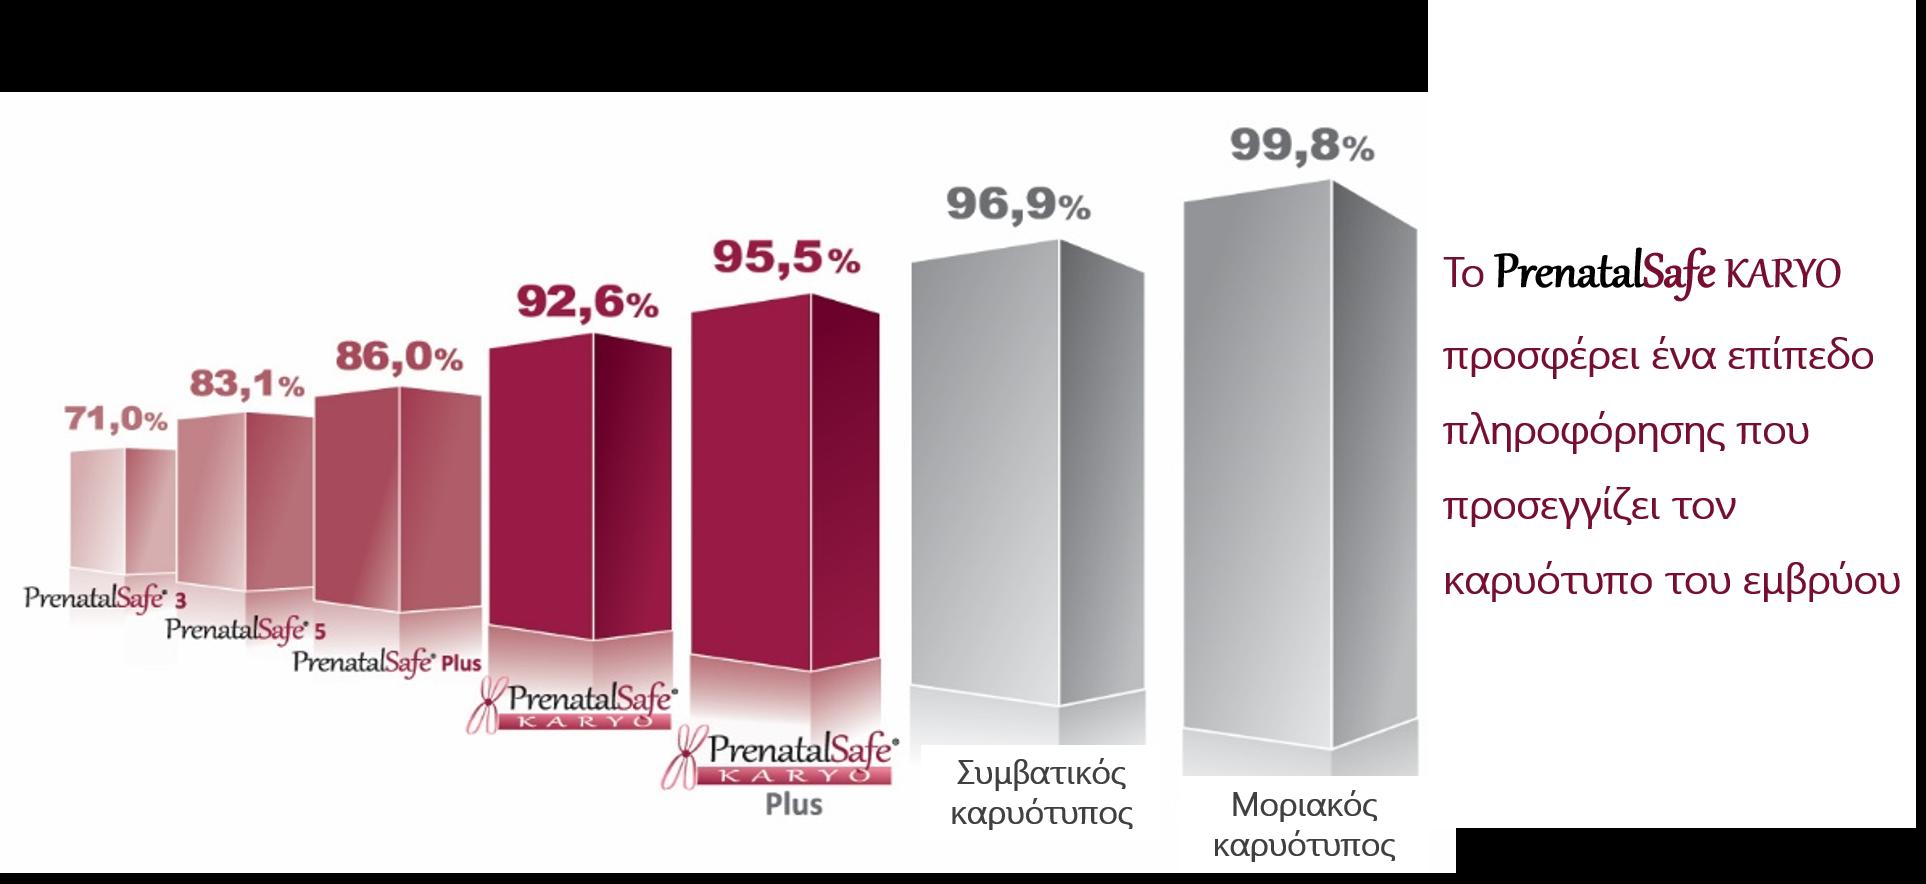 STATISTICS V2